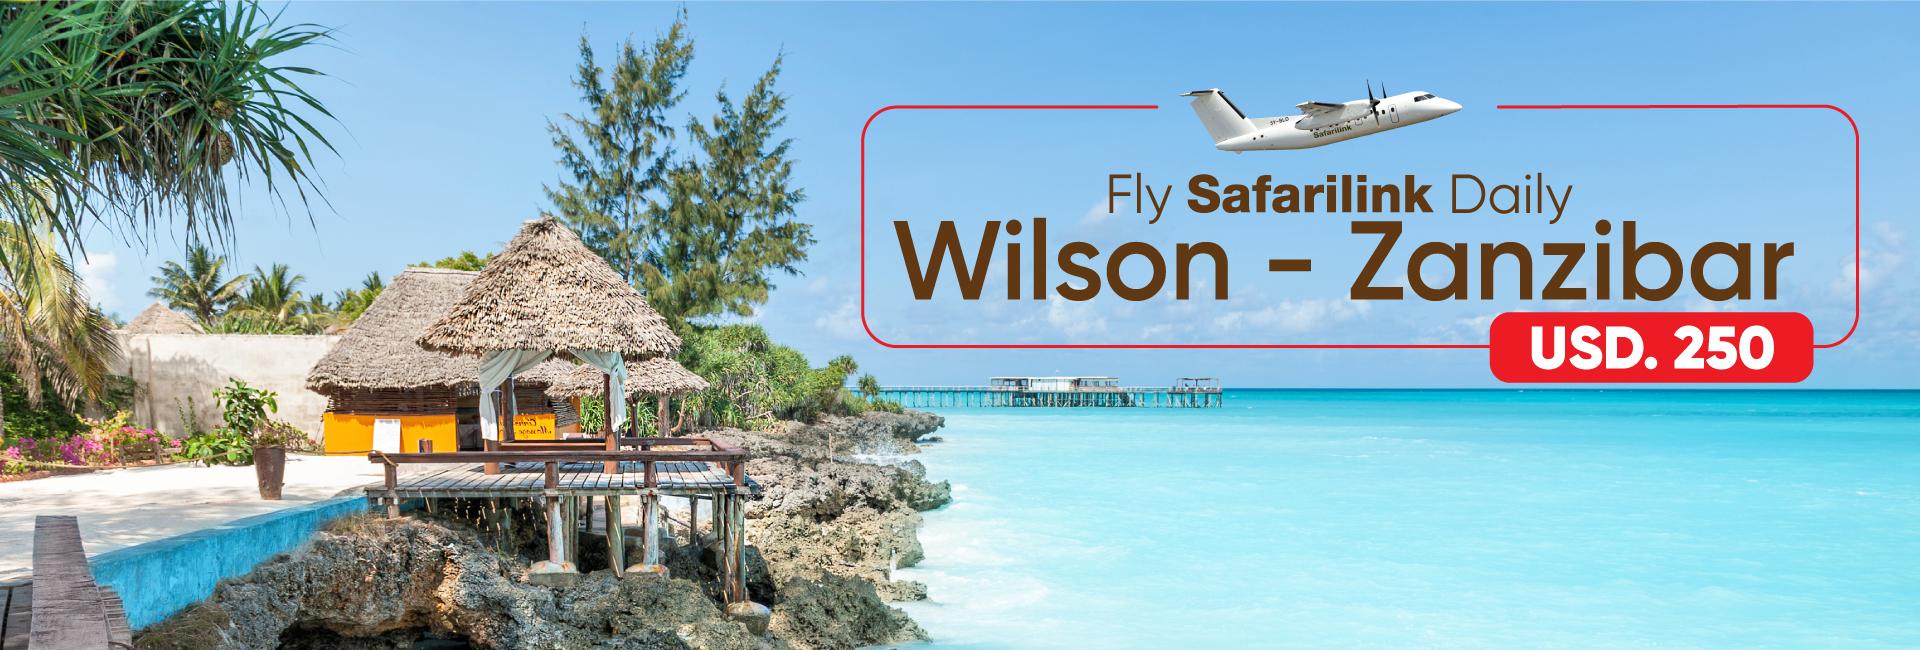 Fly Safarilink To Zanzibar Deals